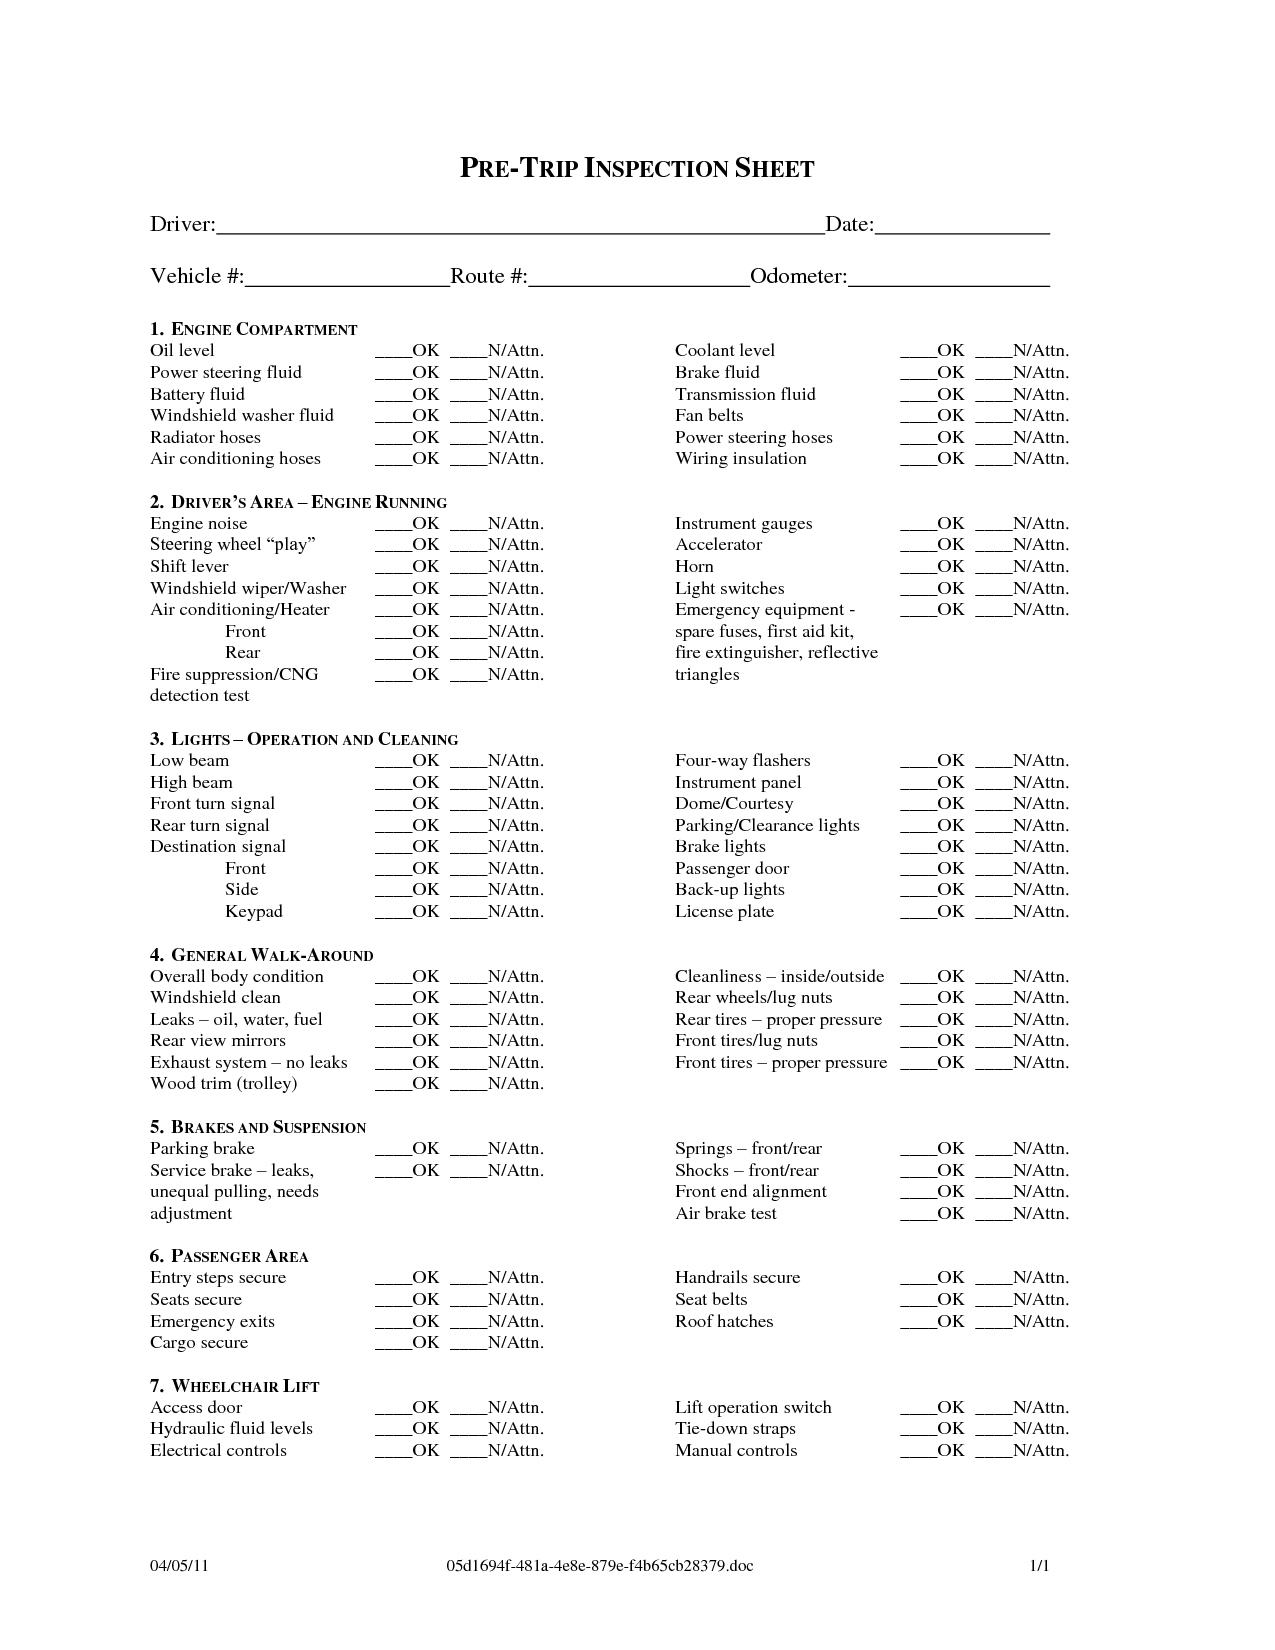 Free Cdl Pre Trip Checklist